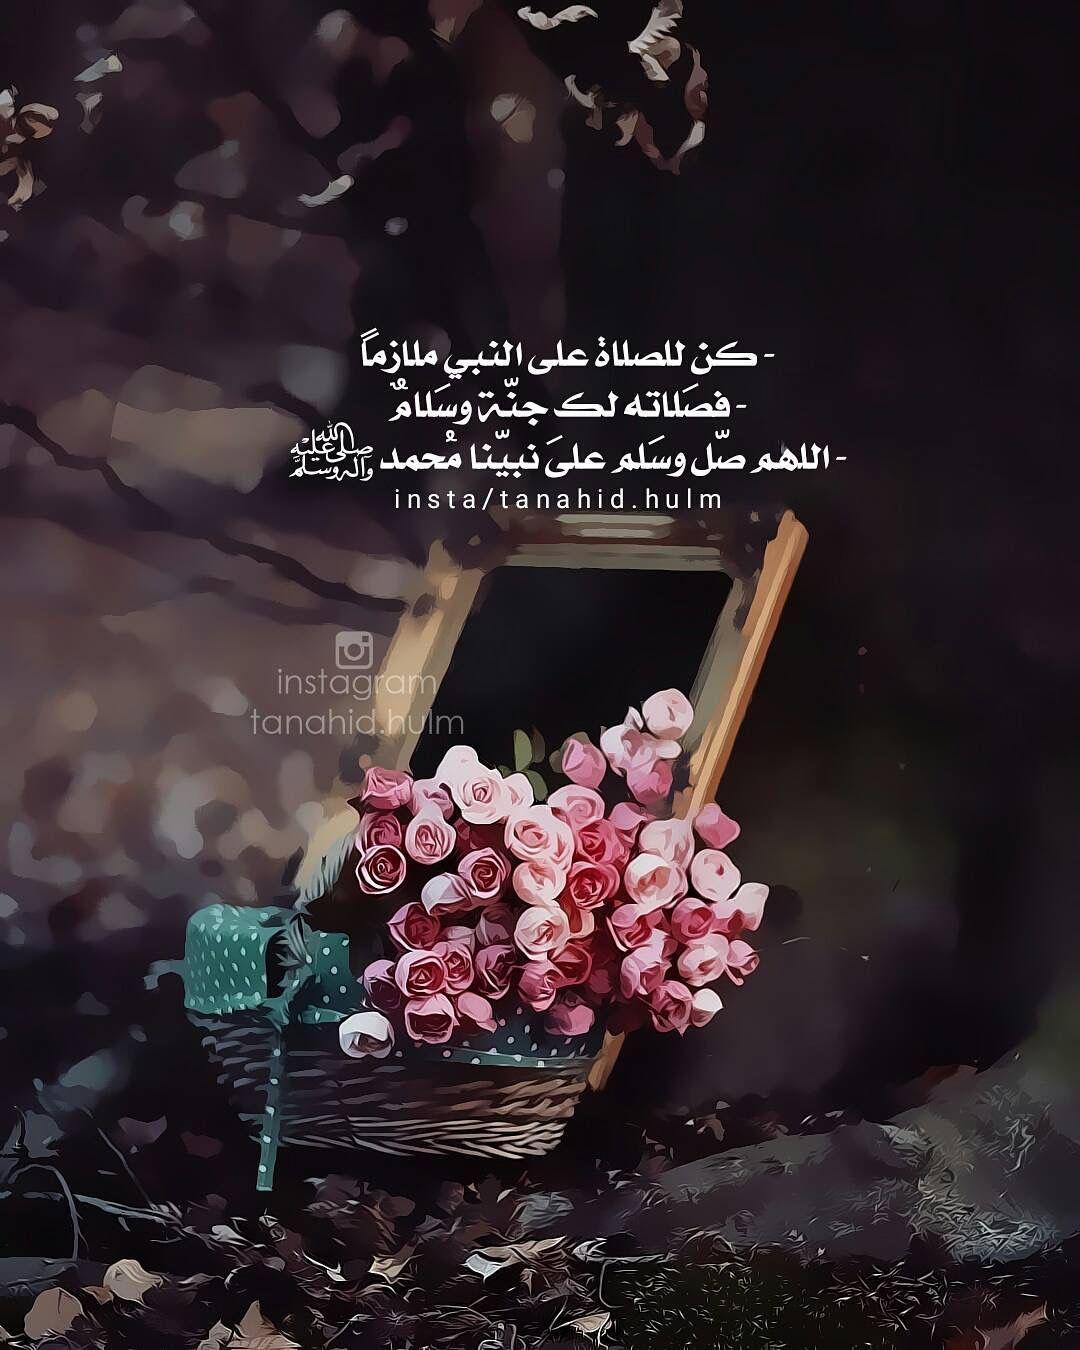 Pin By صدقة جارية On اللهم صل وسلم على نبينا محمد و على آله وصحبه Beautiful Quran Quotes Quran Quotes Love Quran Quotes Inspirational